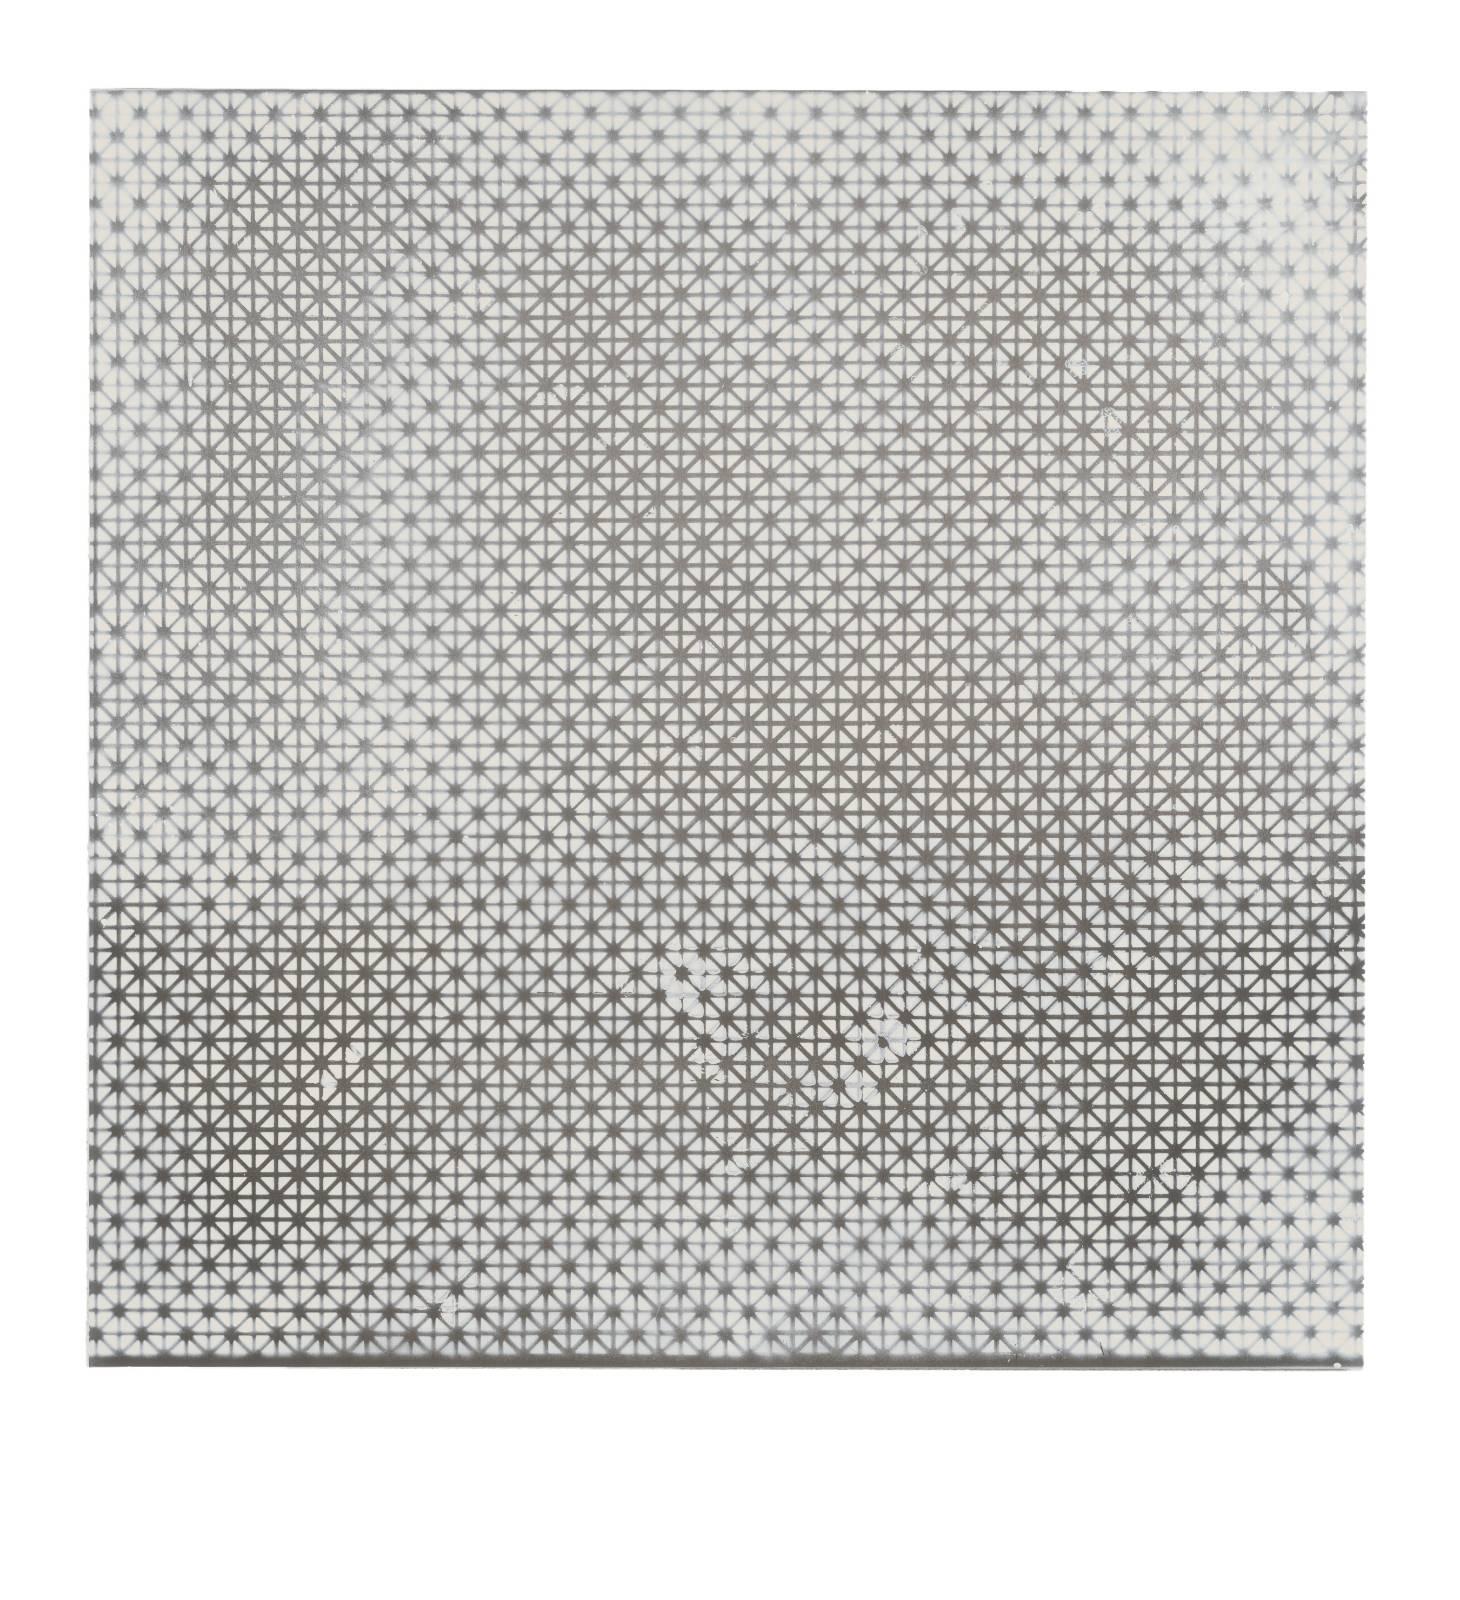 STAIN : 40.711679, -73.935740, 2015, spraypaint on aluminium, 81,3 x 81,3 cm